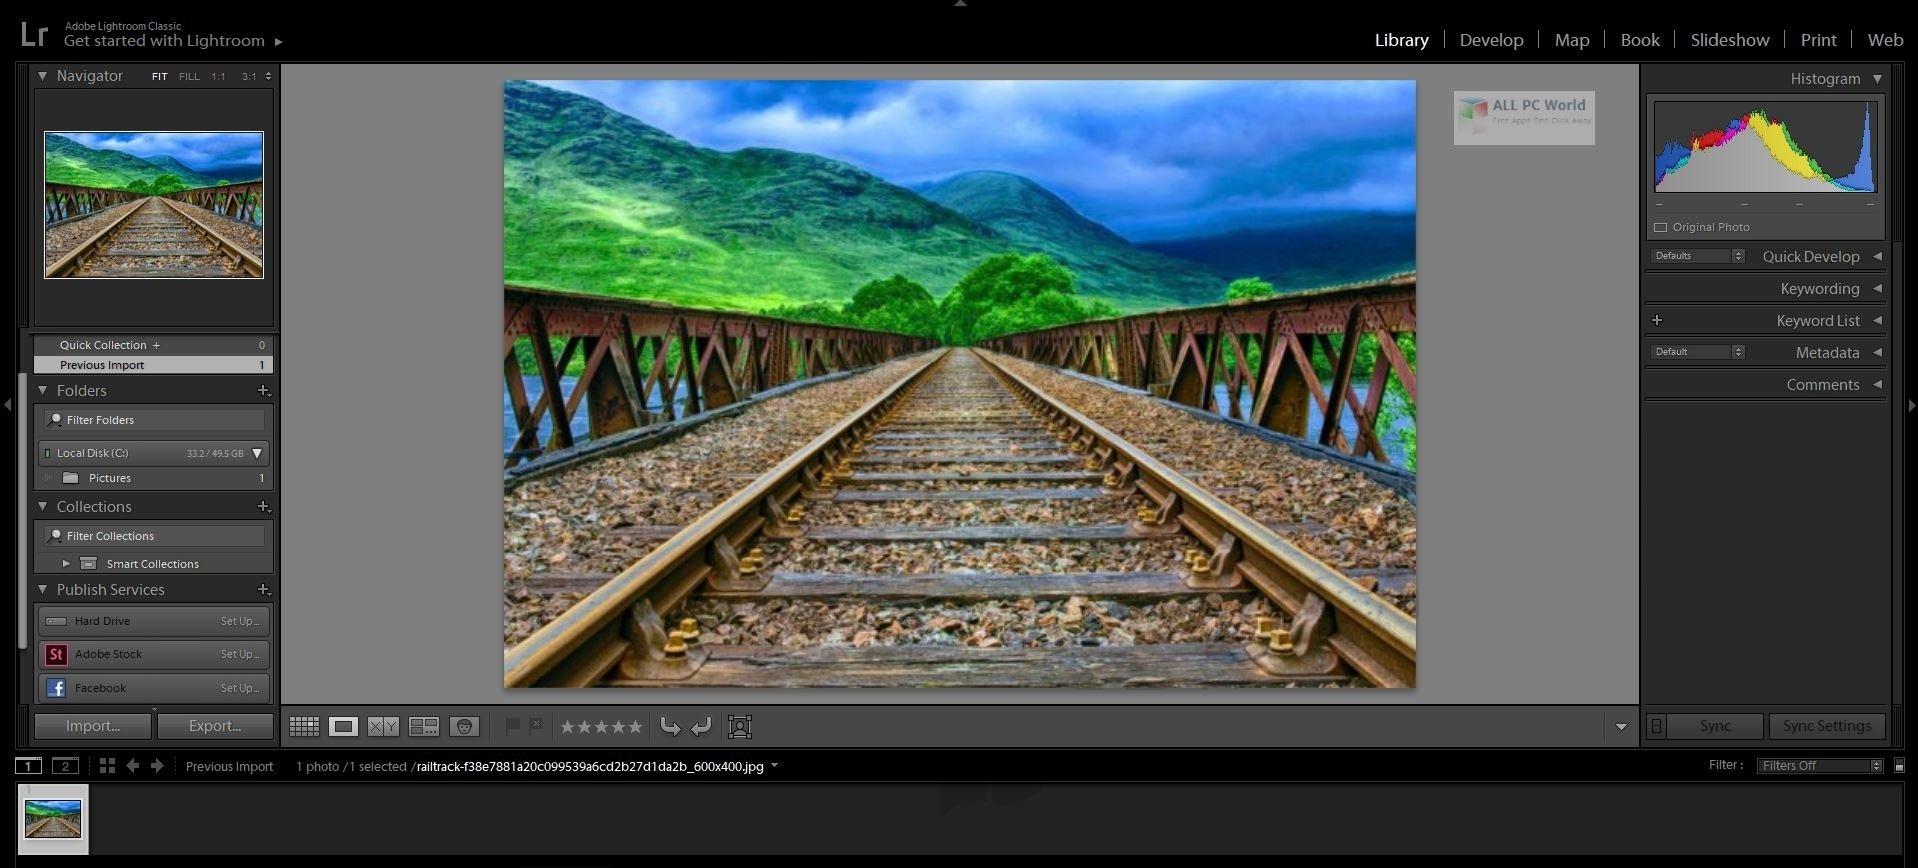 Adobe Photoshop Lightroom Classic CC 2020 v9.0 Download